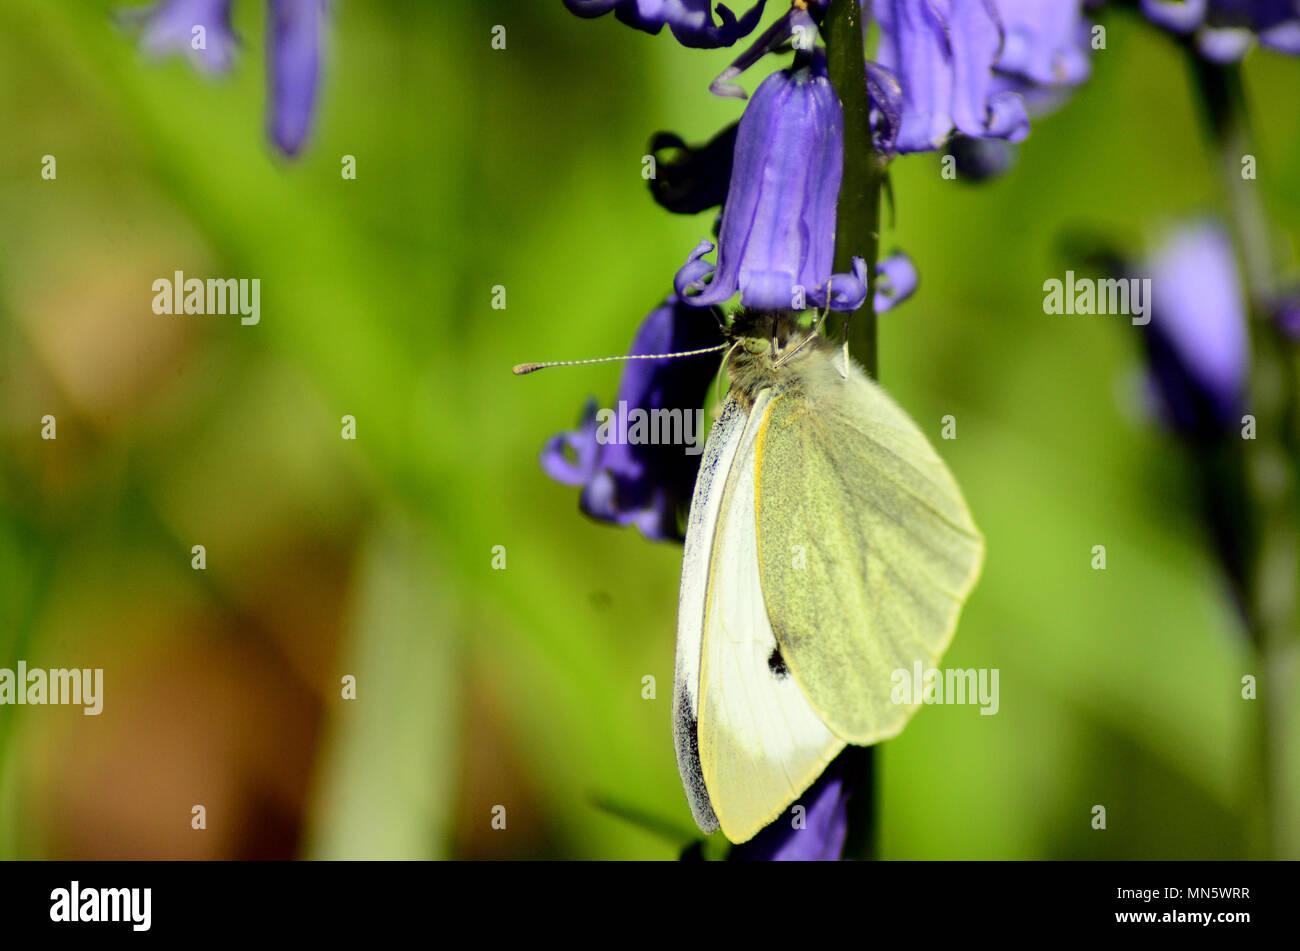 Large white butterfly feeding on bluebell, UK - Stock Image